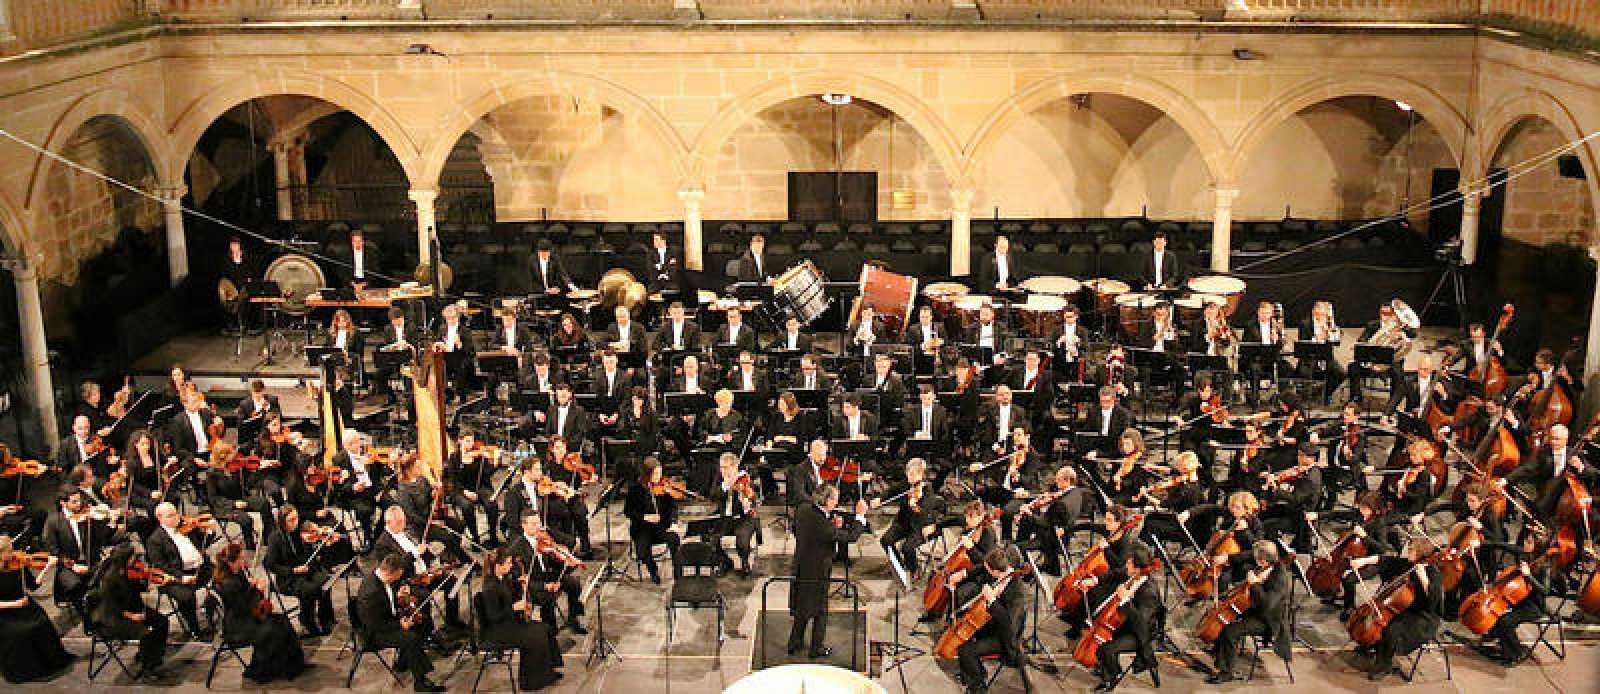 Orquesta Sinfónica RTVE